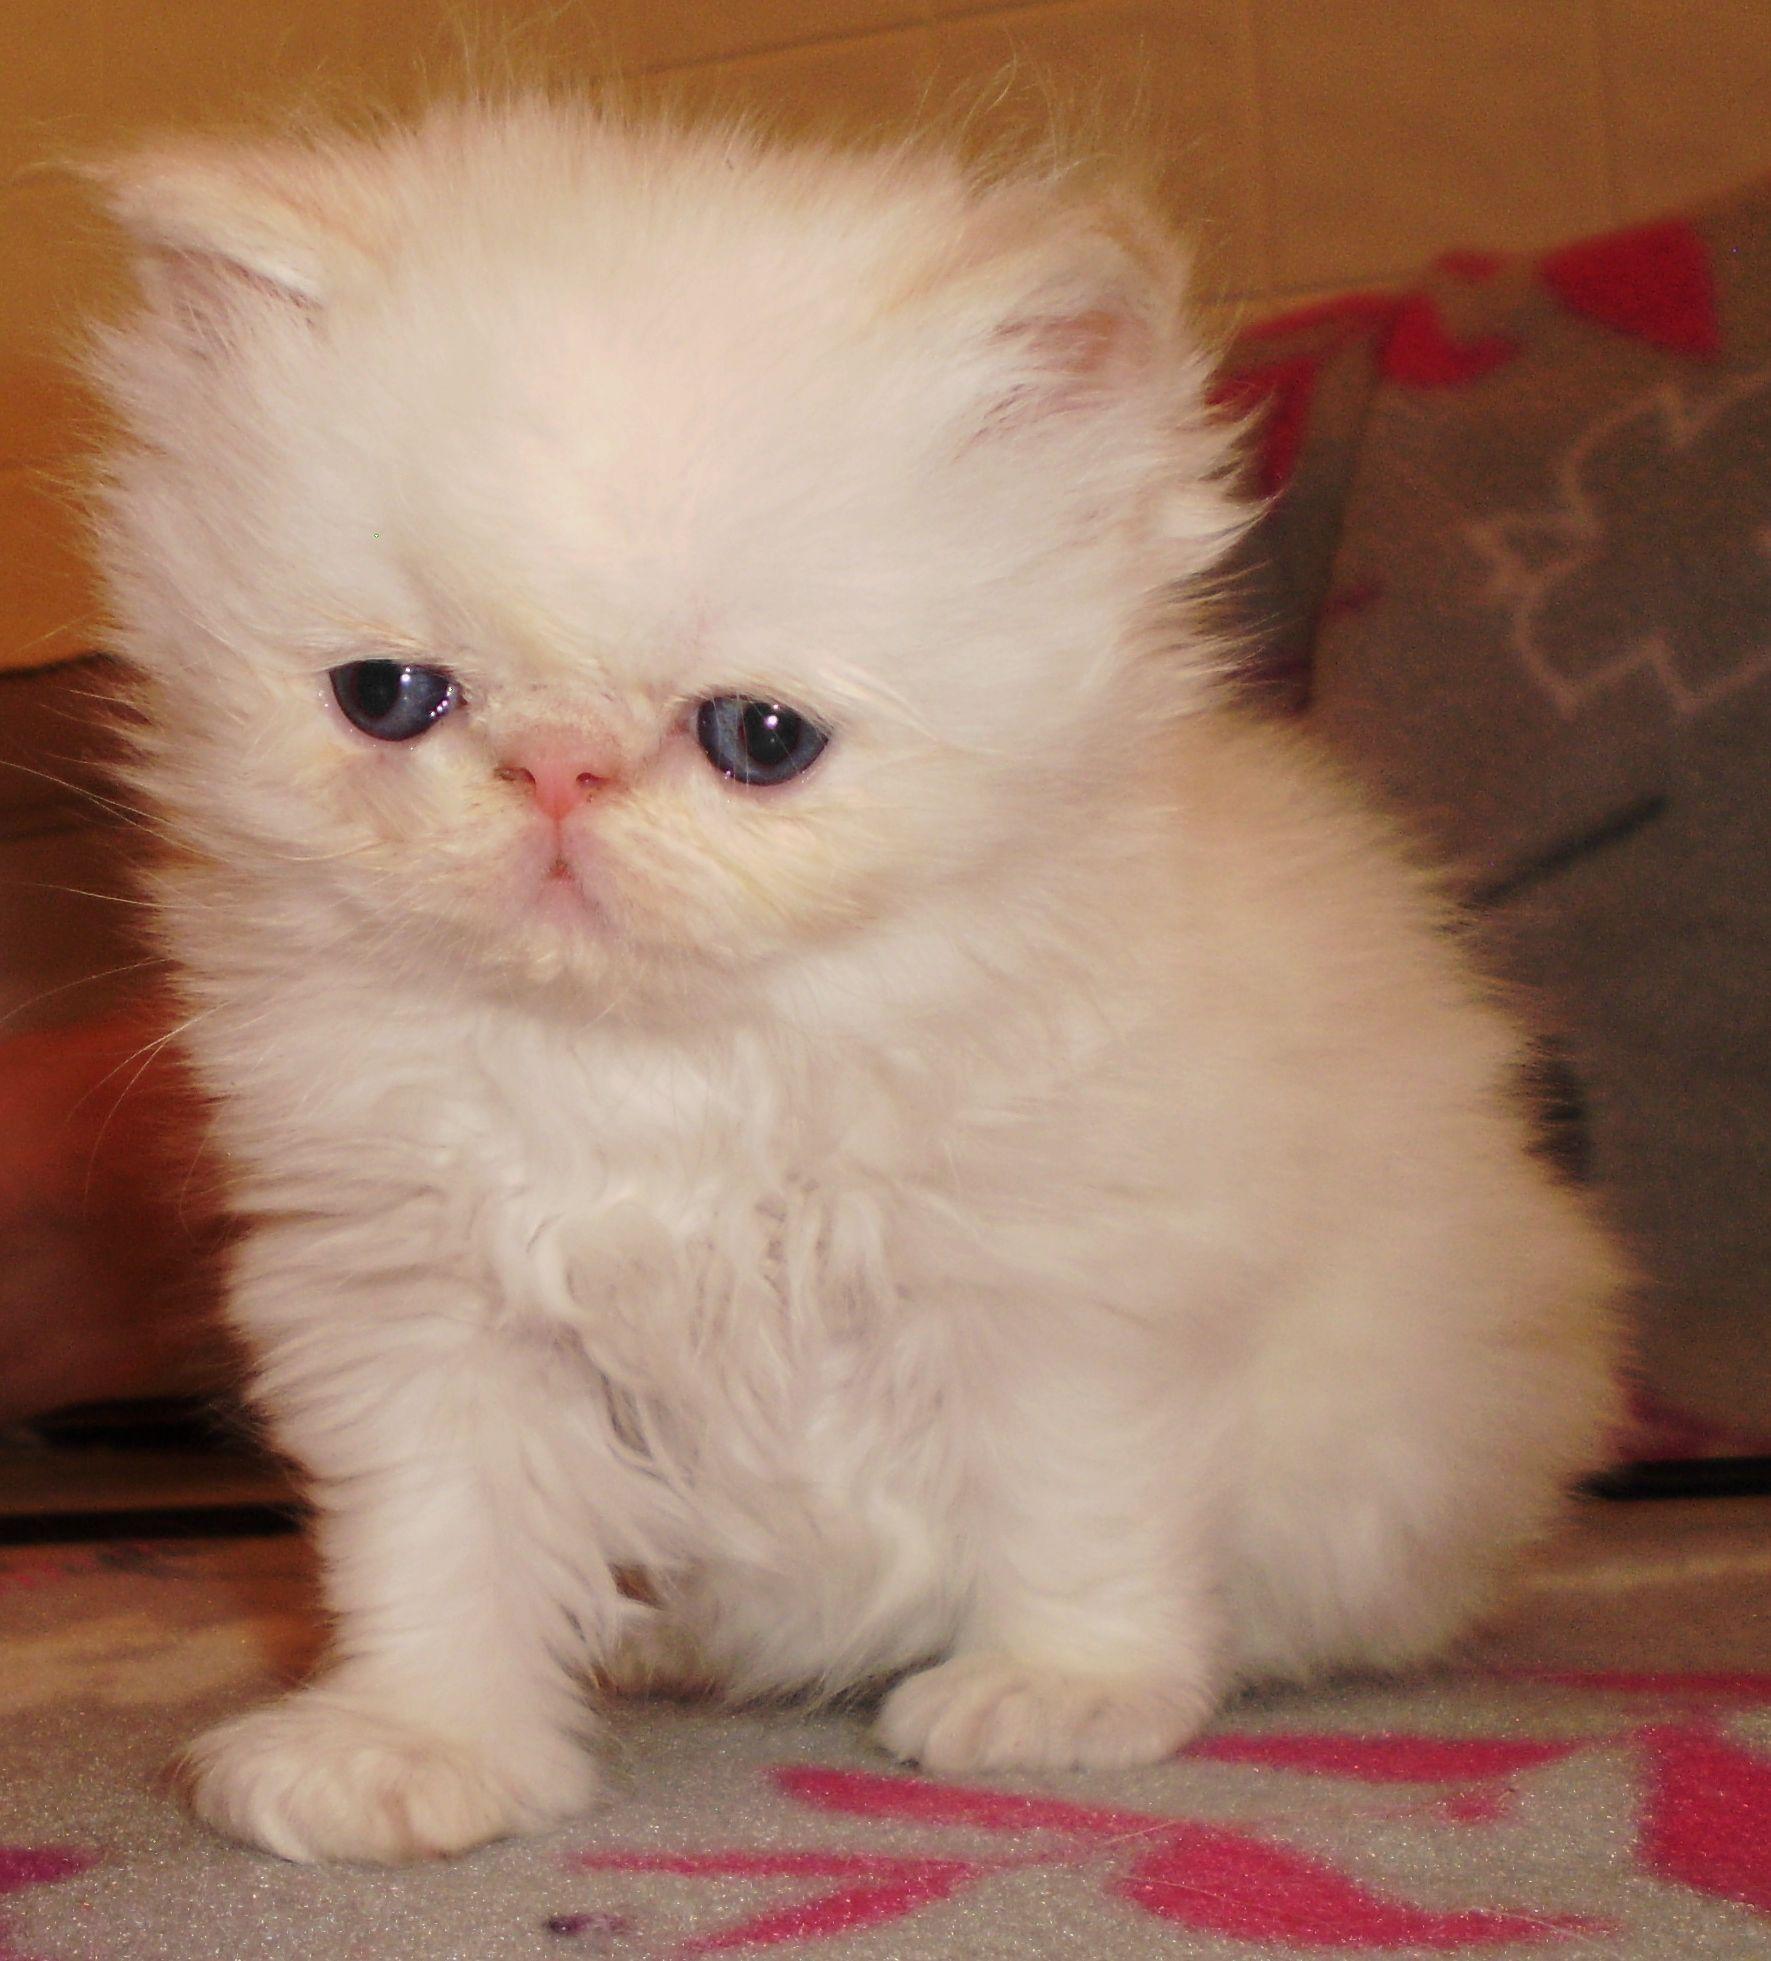 Balinese Munchkin Cat Himalayan Persian Kittens Adults For Sale Windysweptt Munchkincat Cat Lovers Persian Kittens Cats